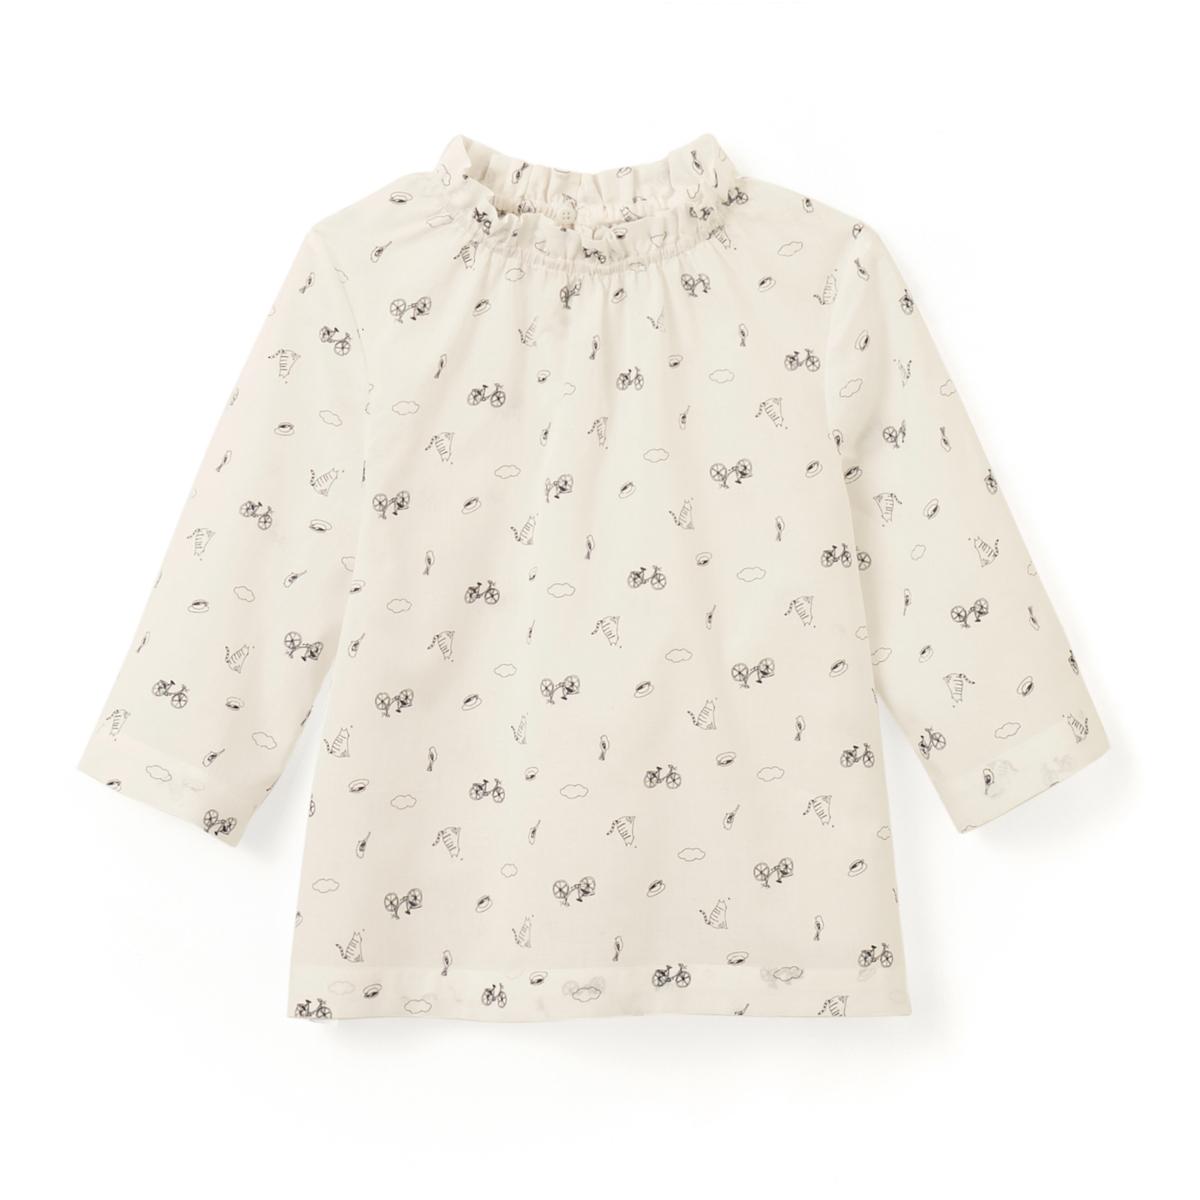 Блузка с рукавами 3/4 и рисунком, 3-12 лет